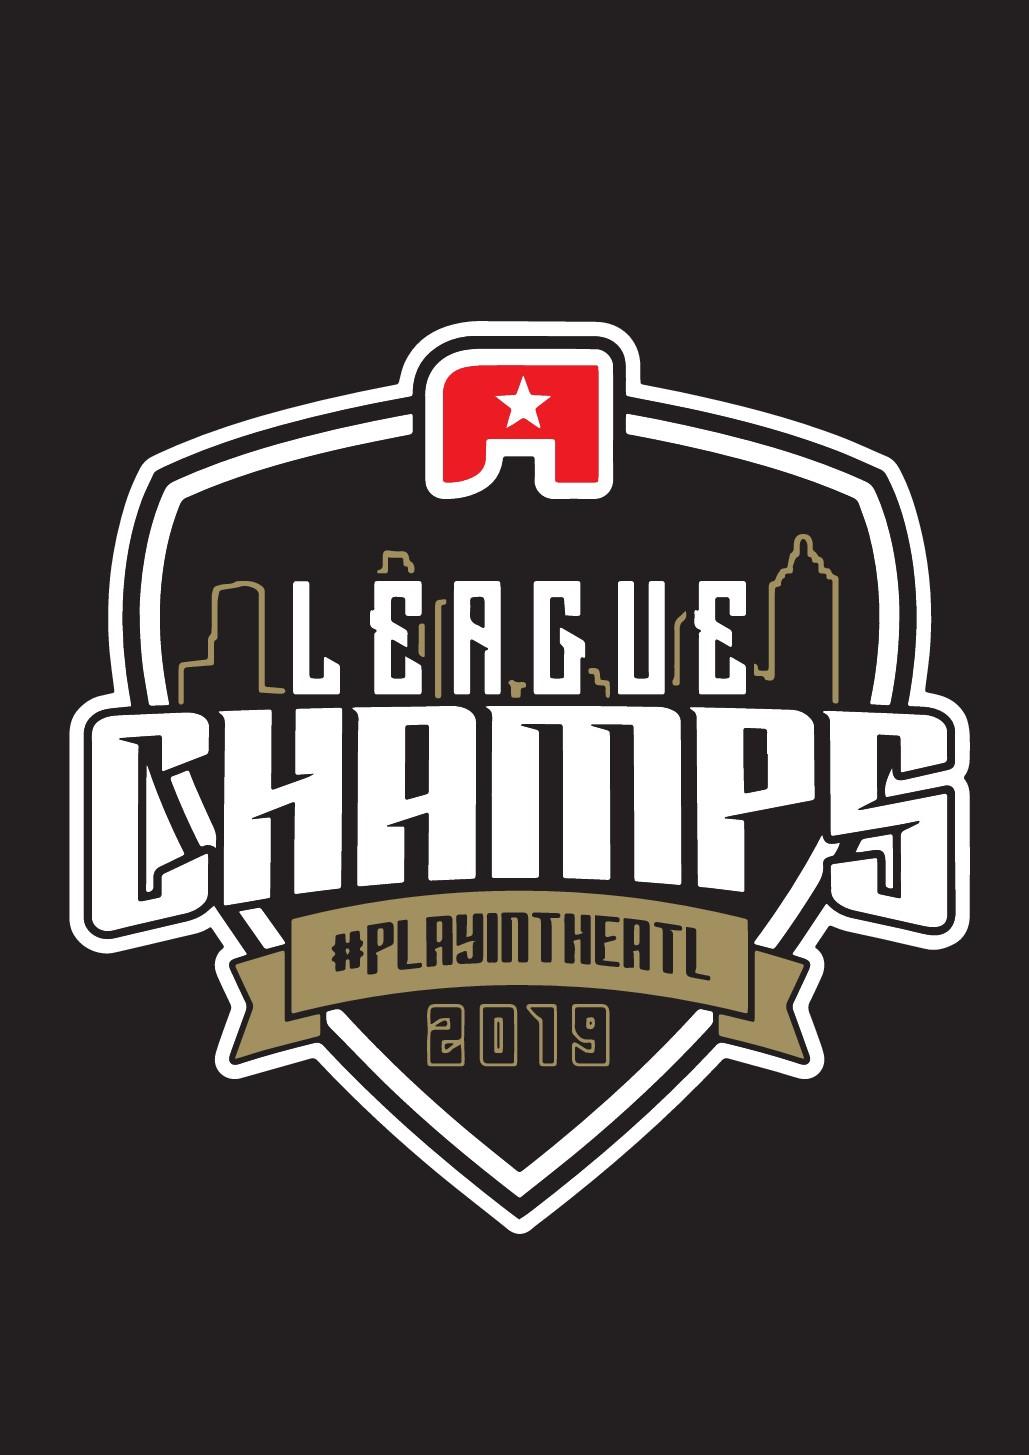 2019 Championship T-Shirts